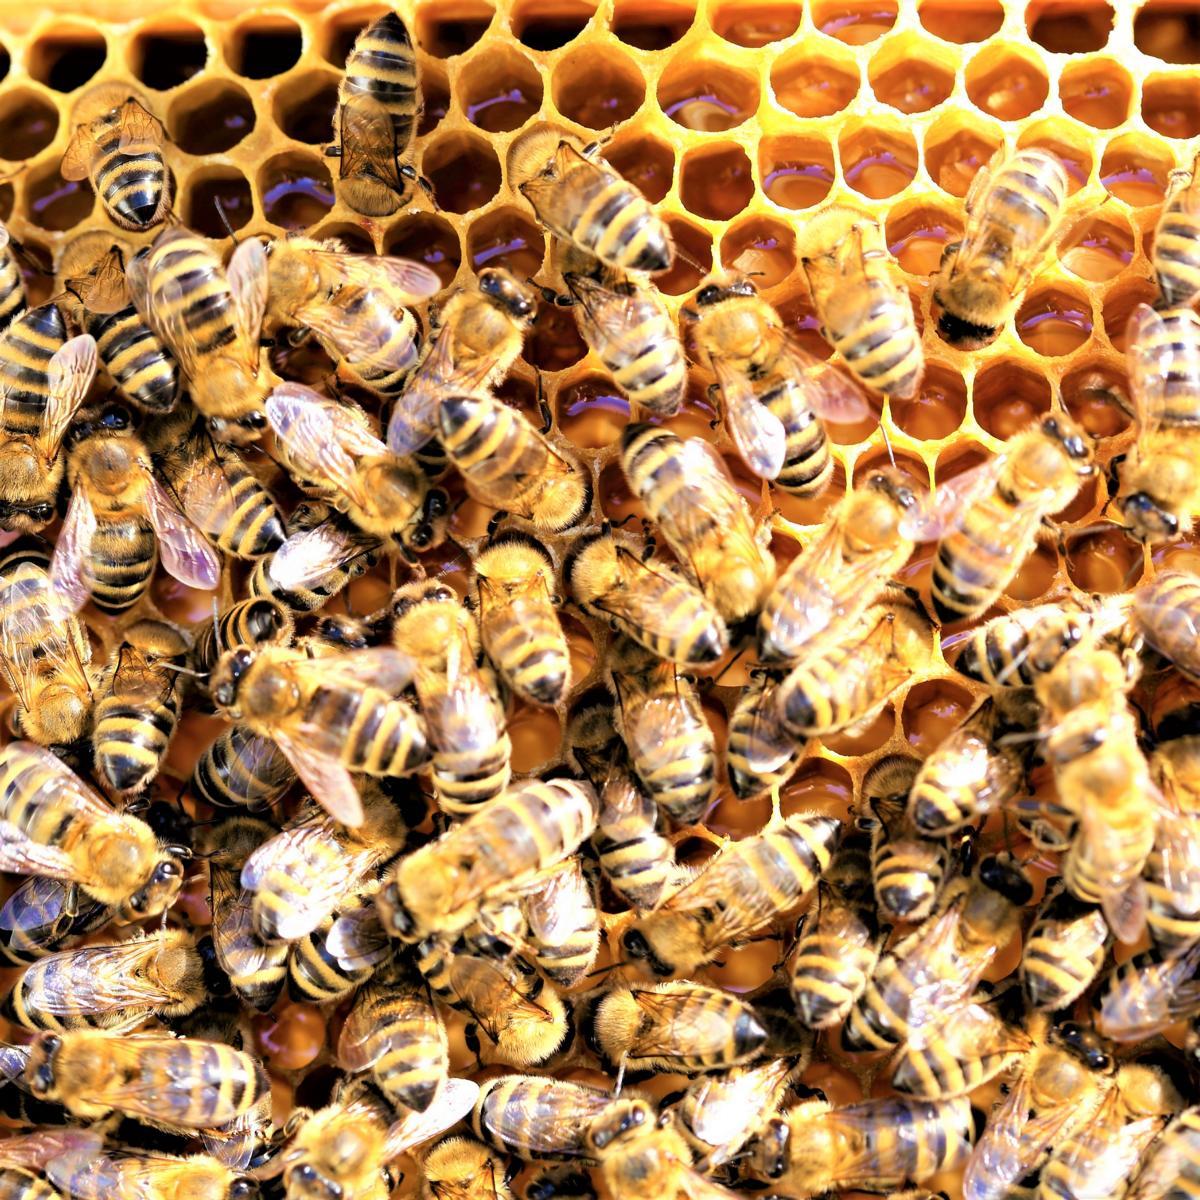 Style Hannover Die Bienenhuette 4 - Die Bienenhütte - Wesensgemäße Bienenhaltung